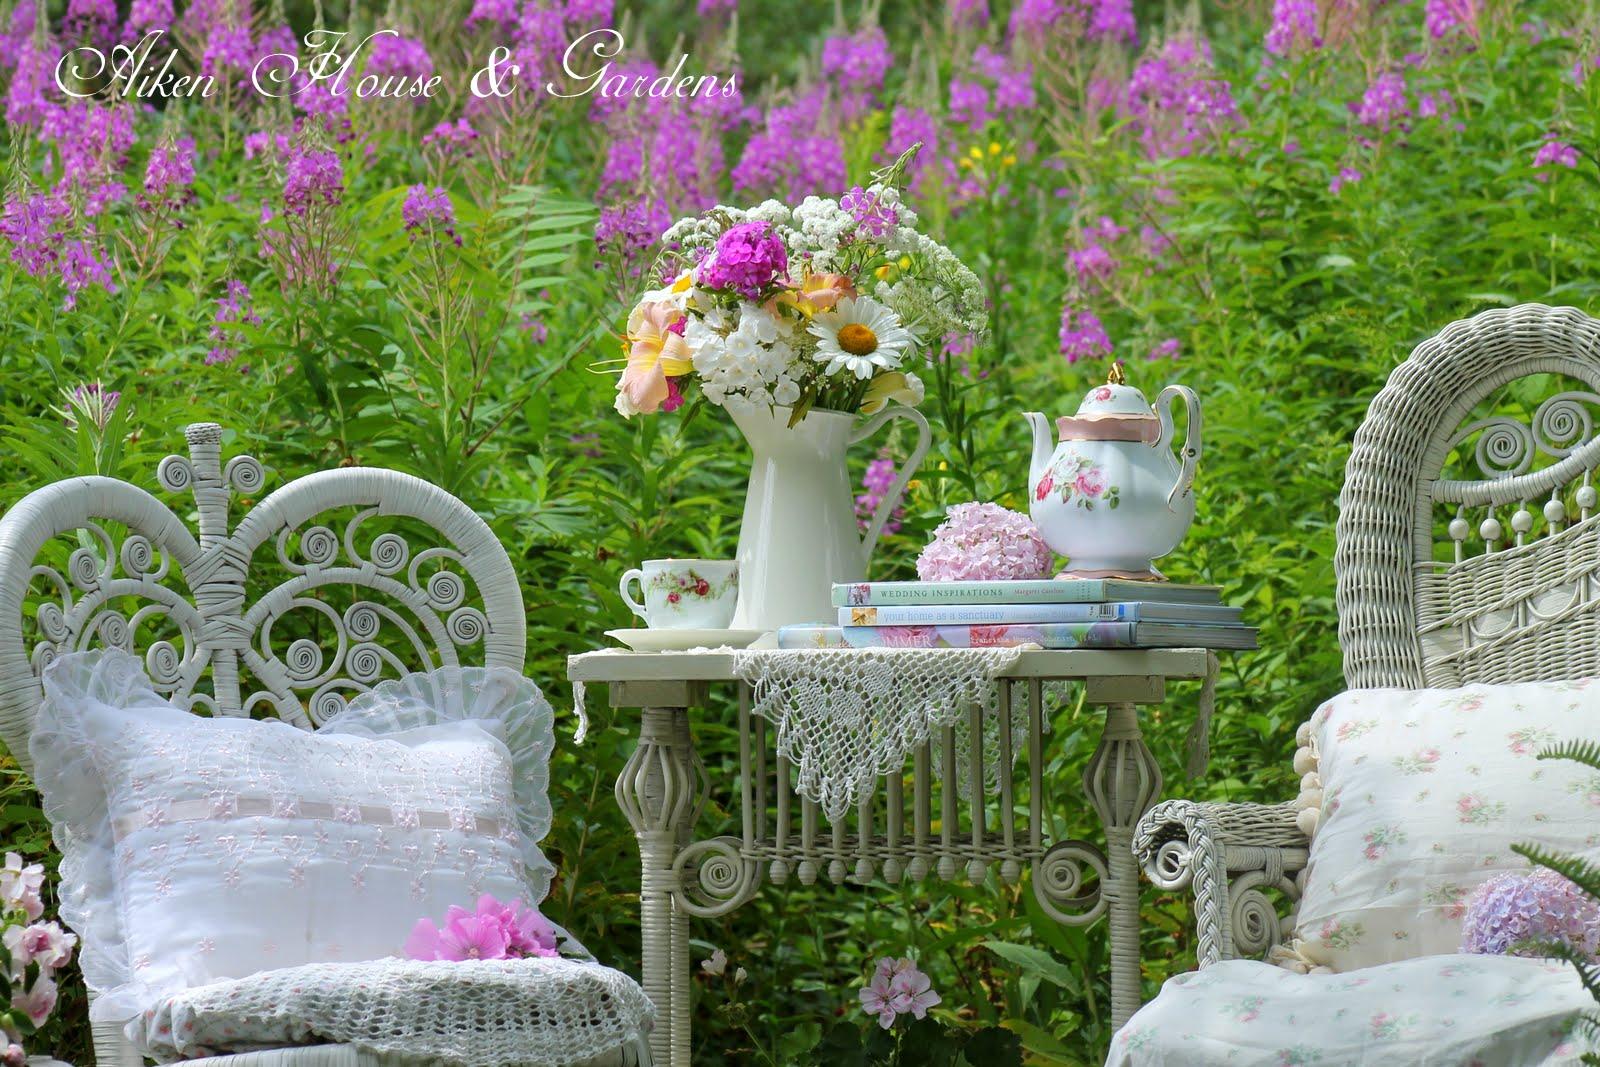 Aiken House Gardens Victorian Garden Tea